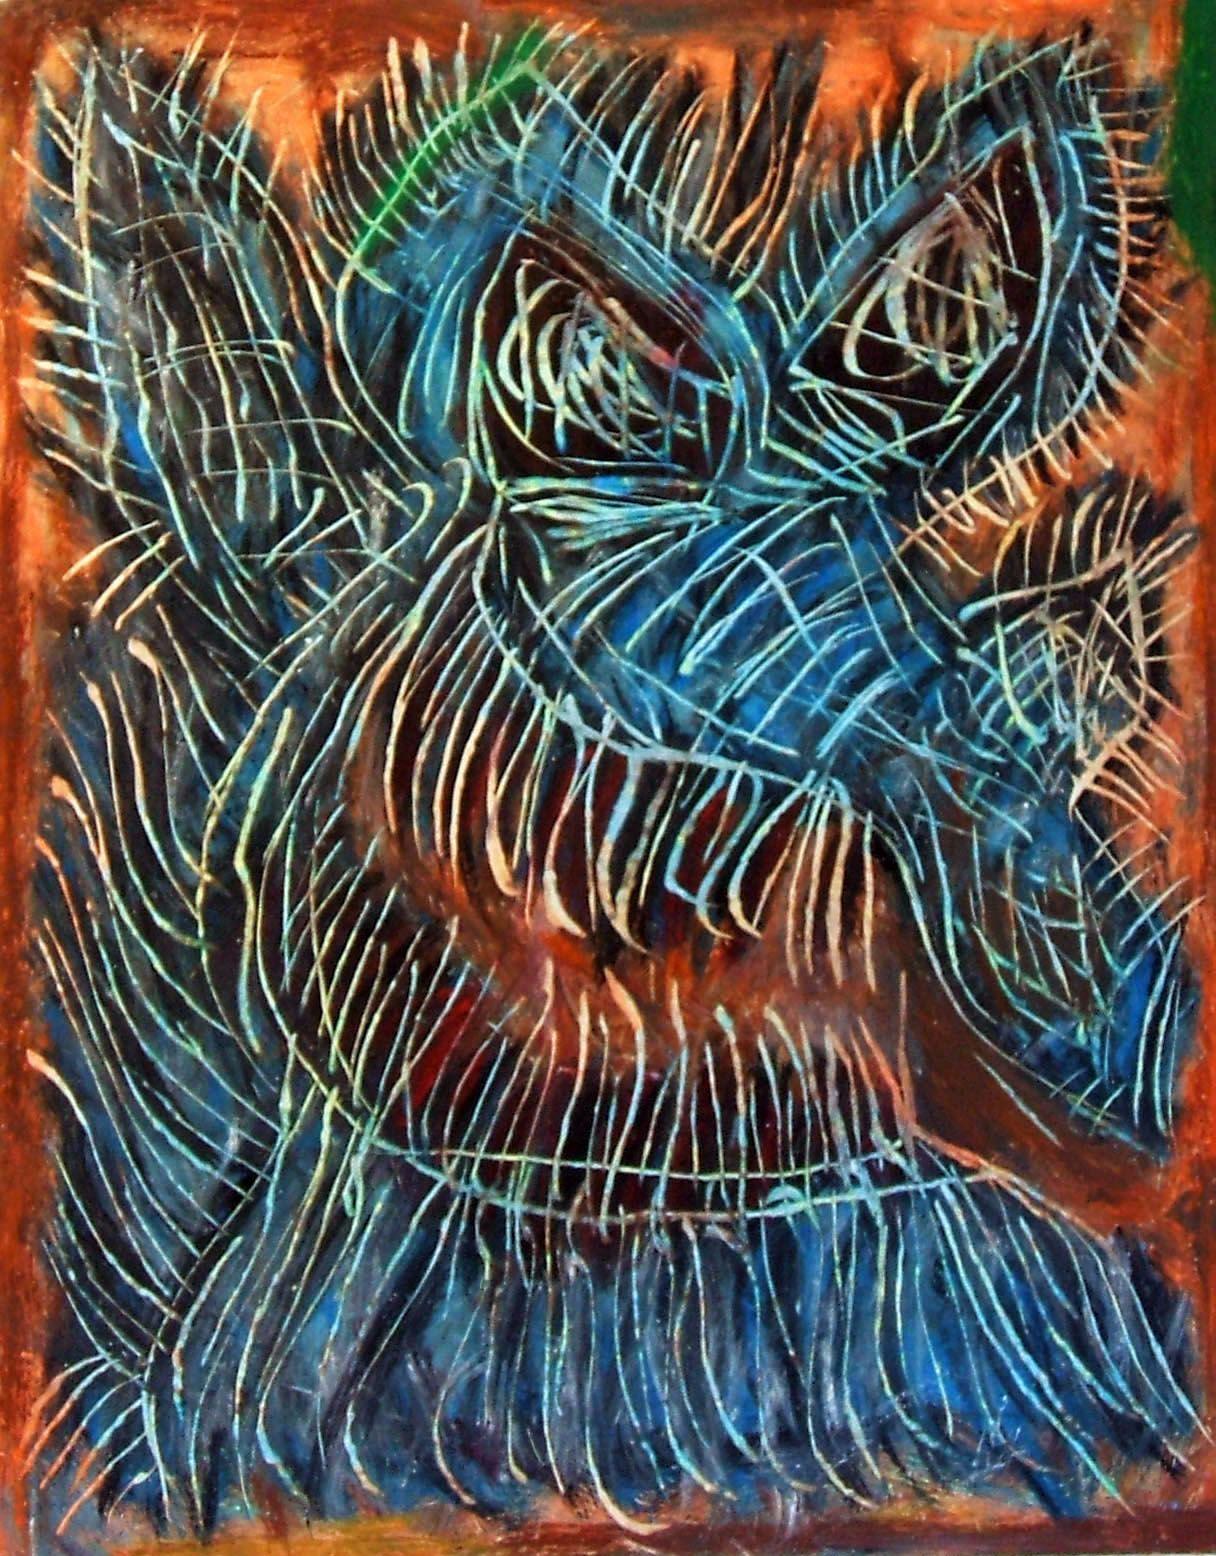 """Orco azzurro"" 2013 Tecnica mista su cartoncino 48x38 ©Pietro Gargano"